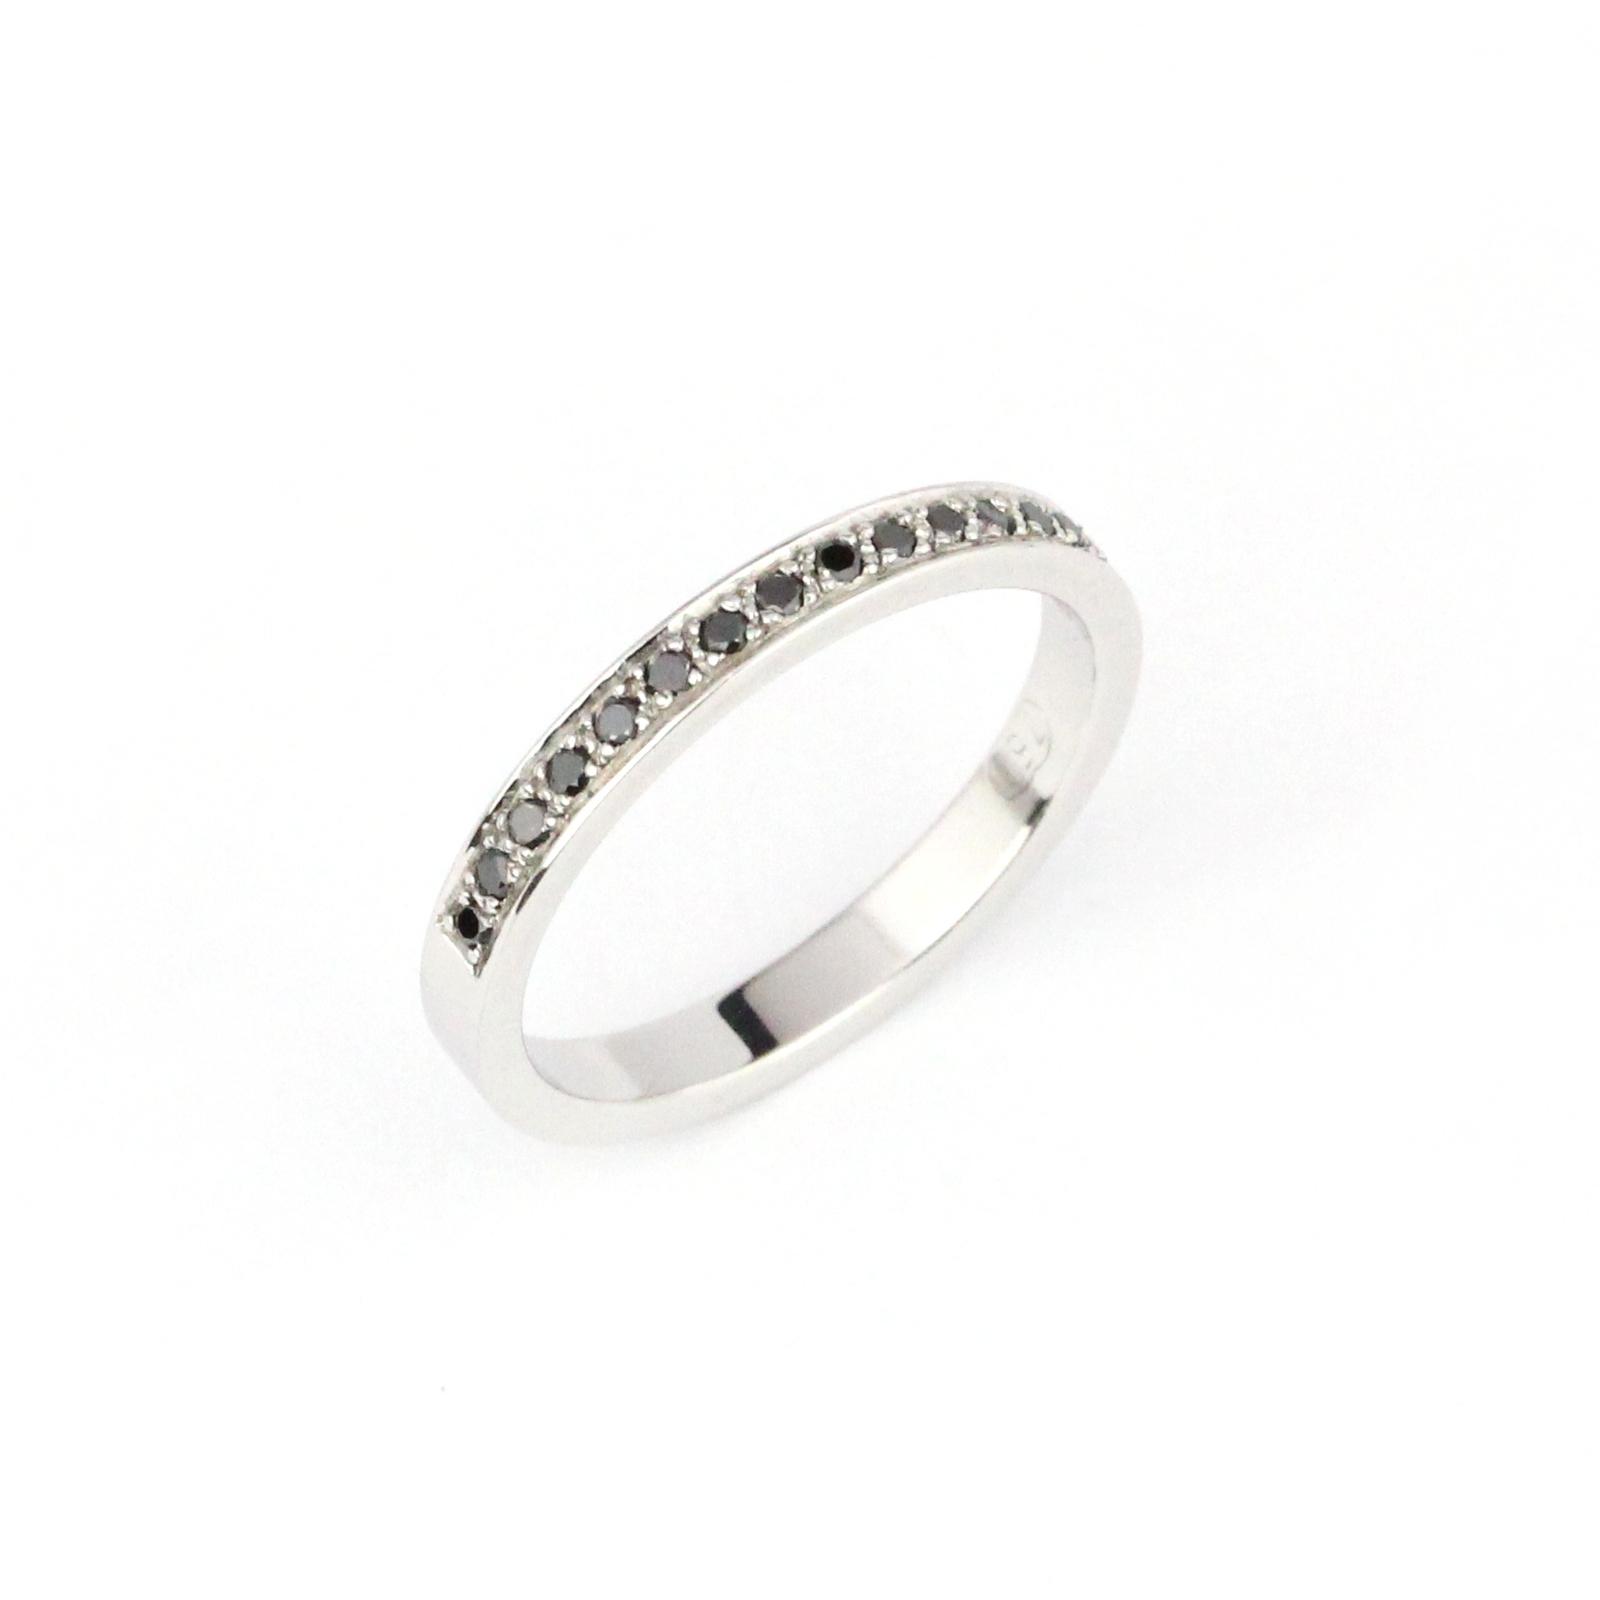 Black diamonds grain set into white gold ring.